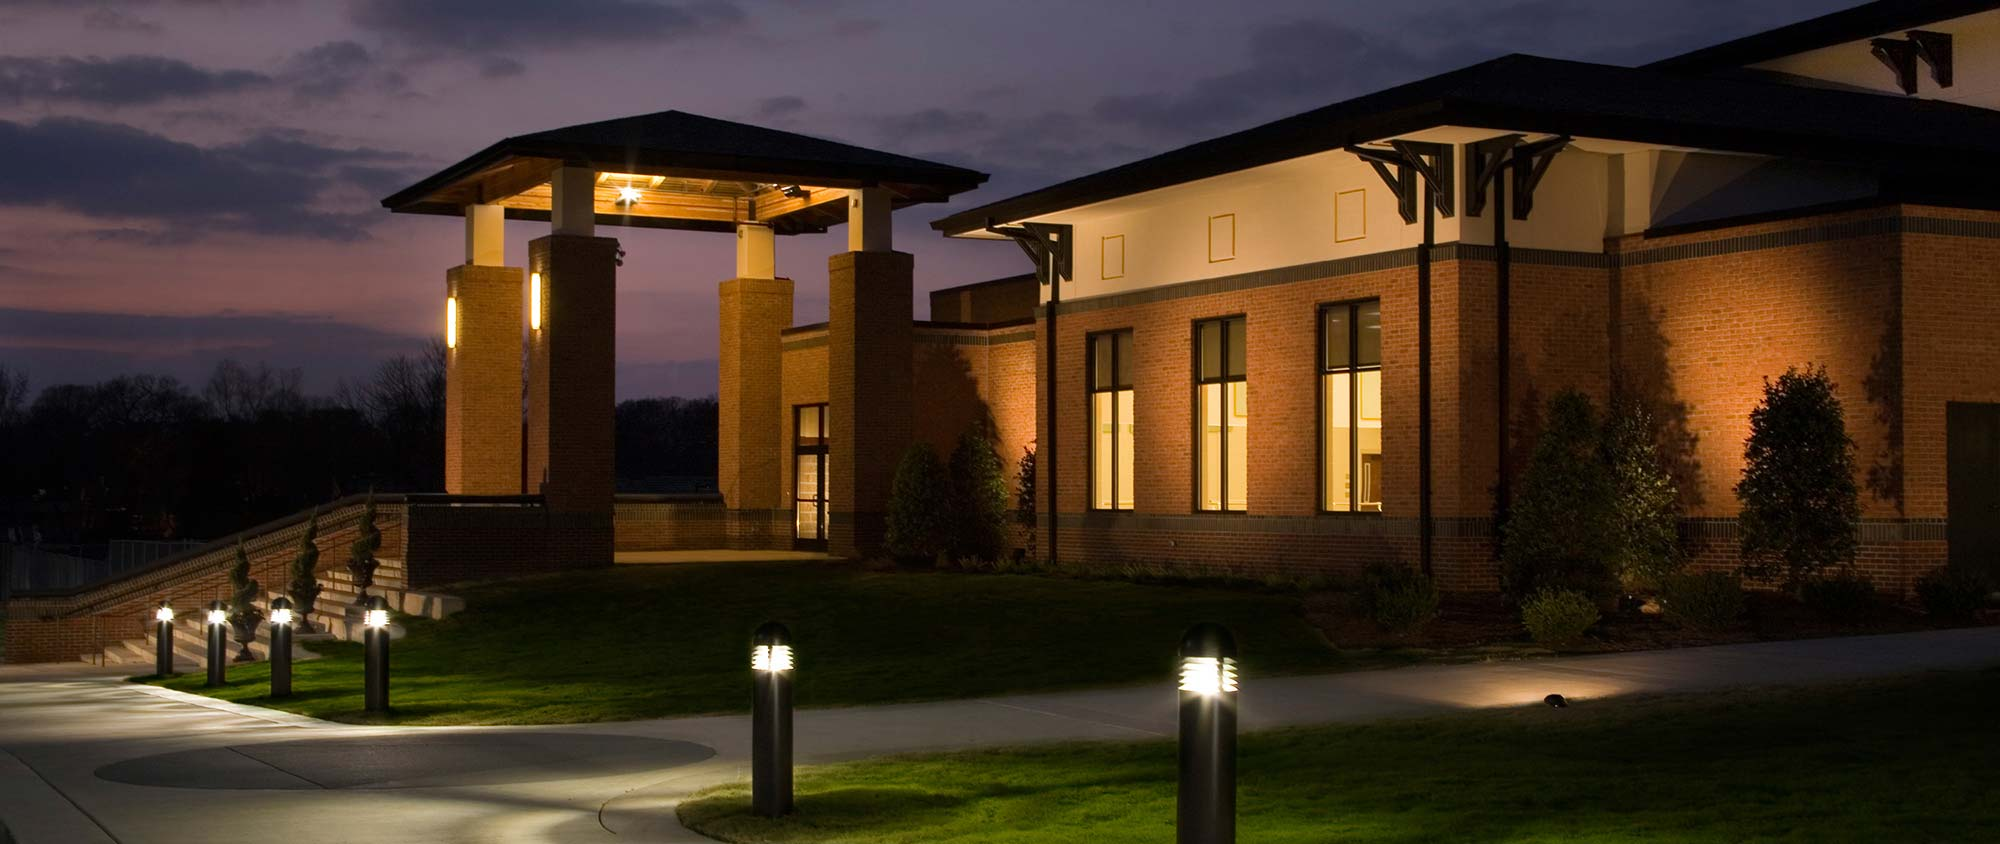 Brentwood Academy Fine Arts Center